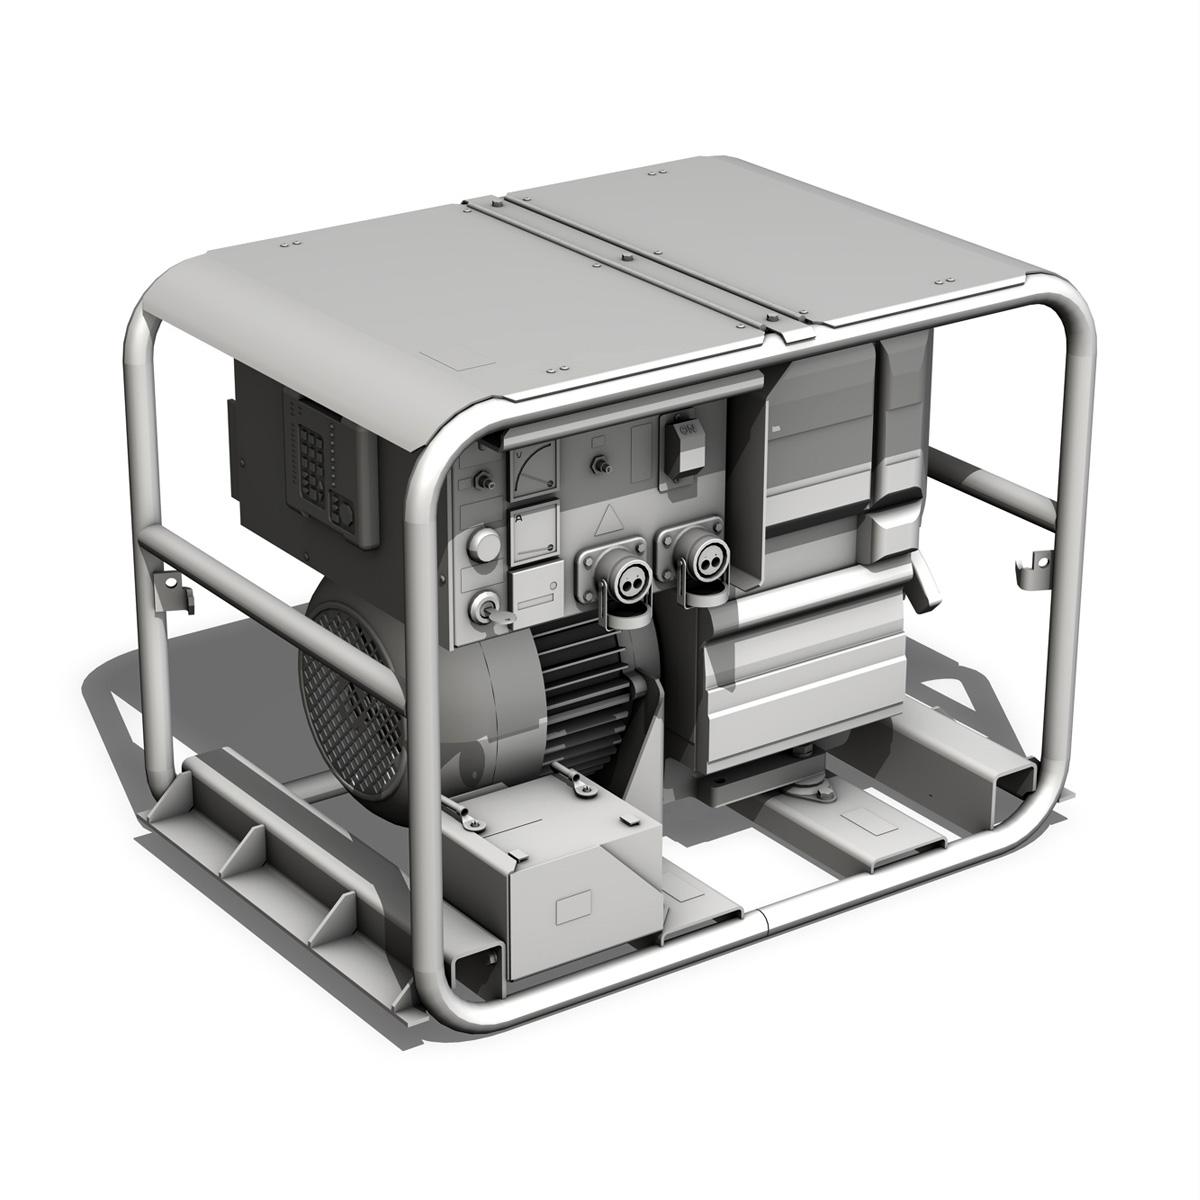 military diesel generator 3d model 3ds fbx c4d lwo obj 188562